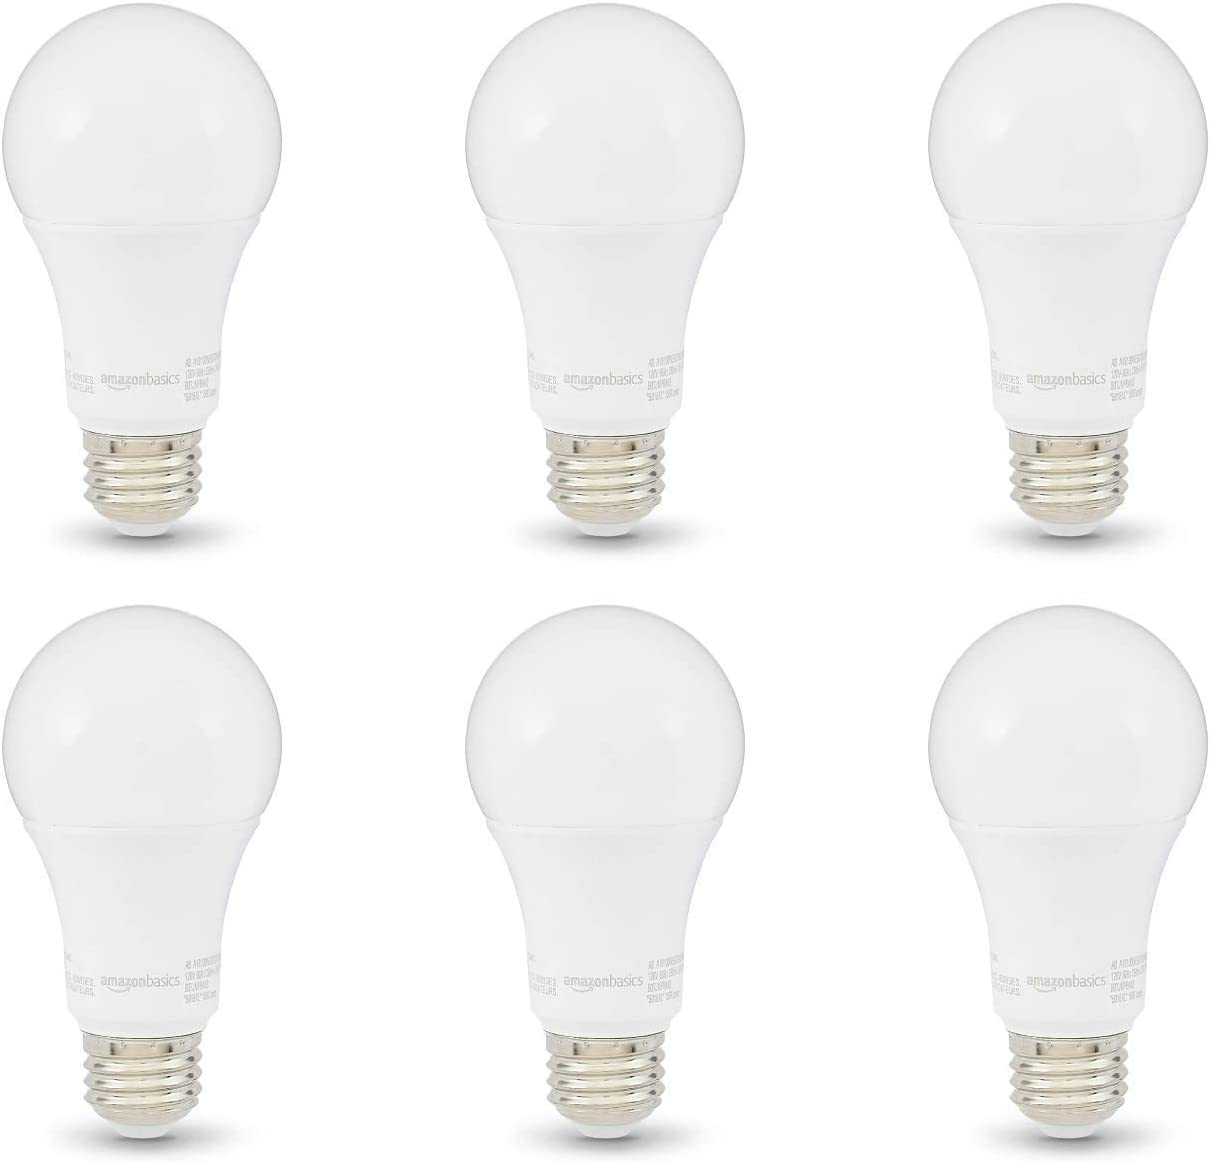 Amazon Basics 100w Equivalent Soft White Non Dimmable 10 000 Hour Lifetime A19 Led Light Bulb 6 Pack